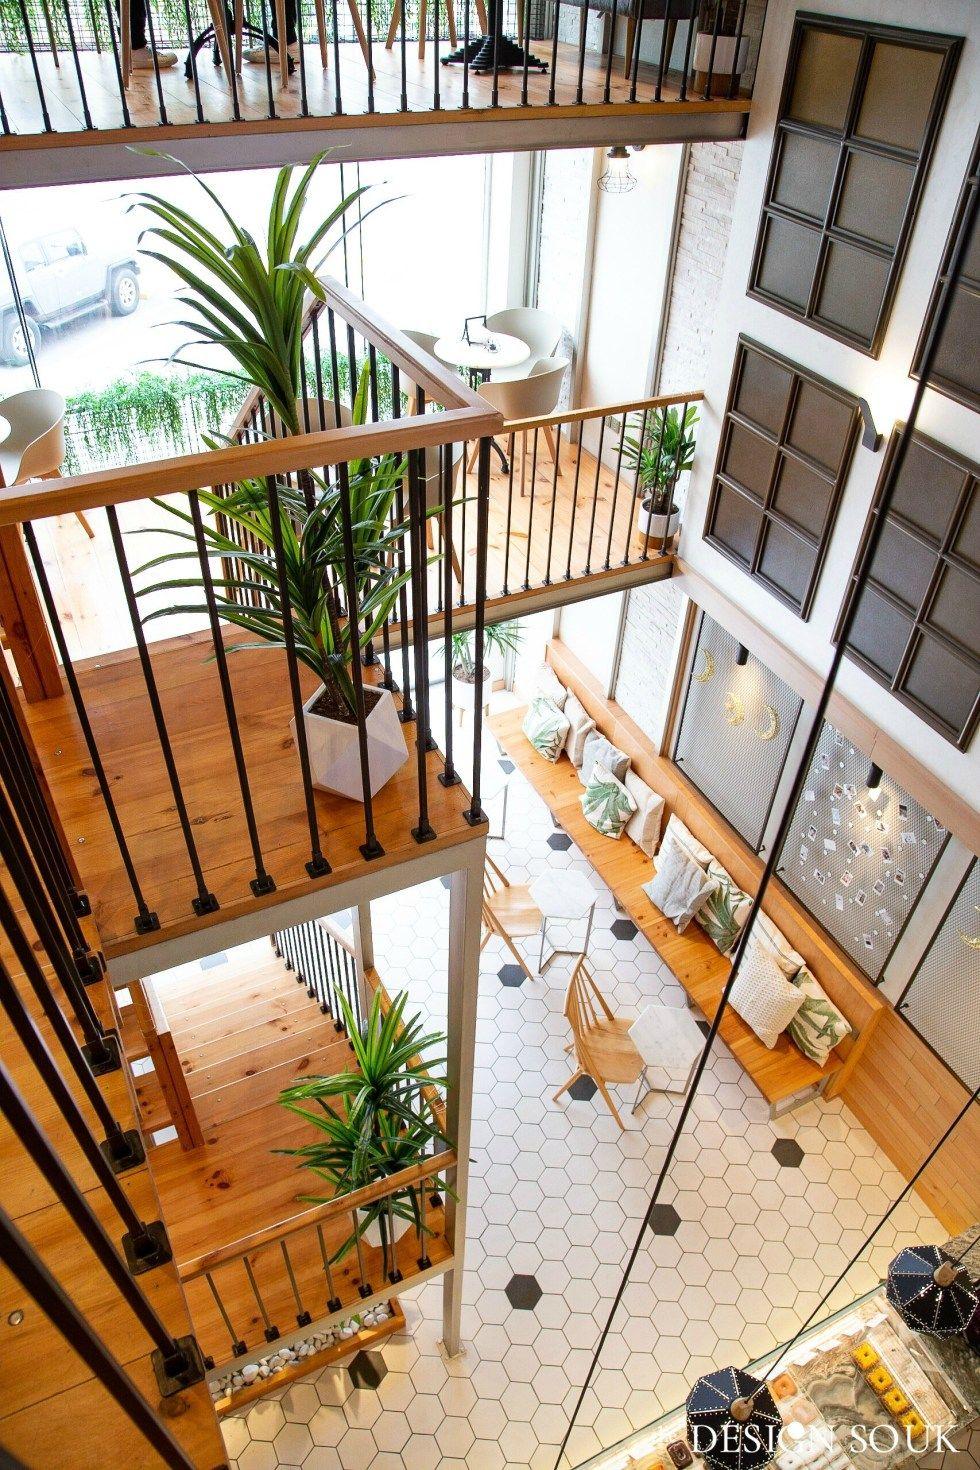 Dozen | Design, Interior design living room, House styles